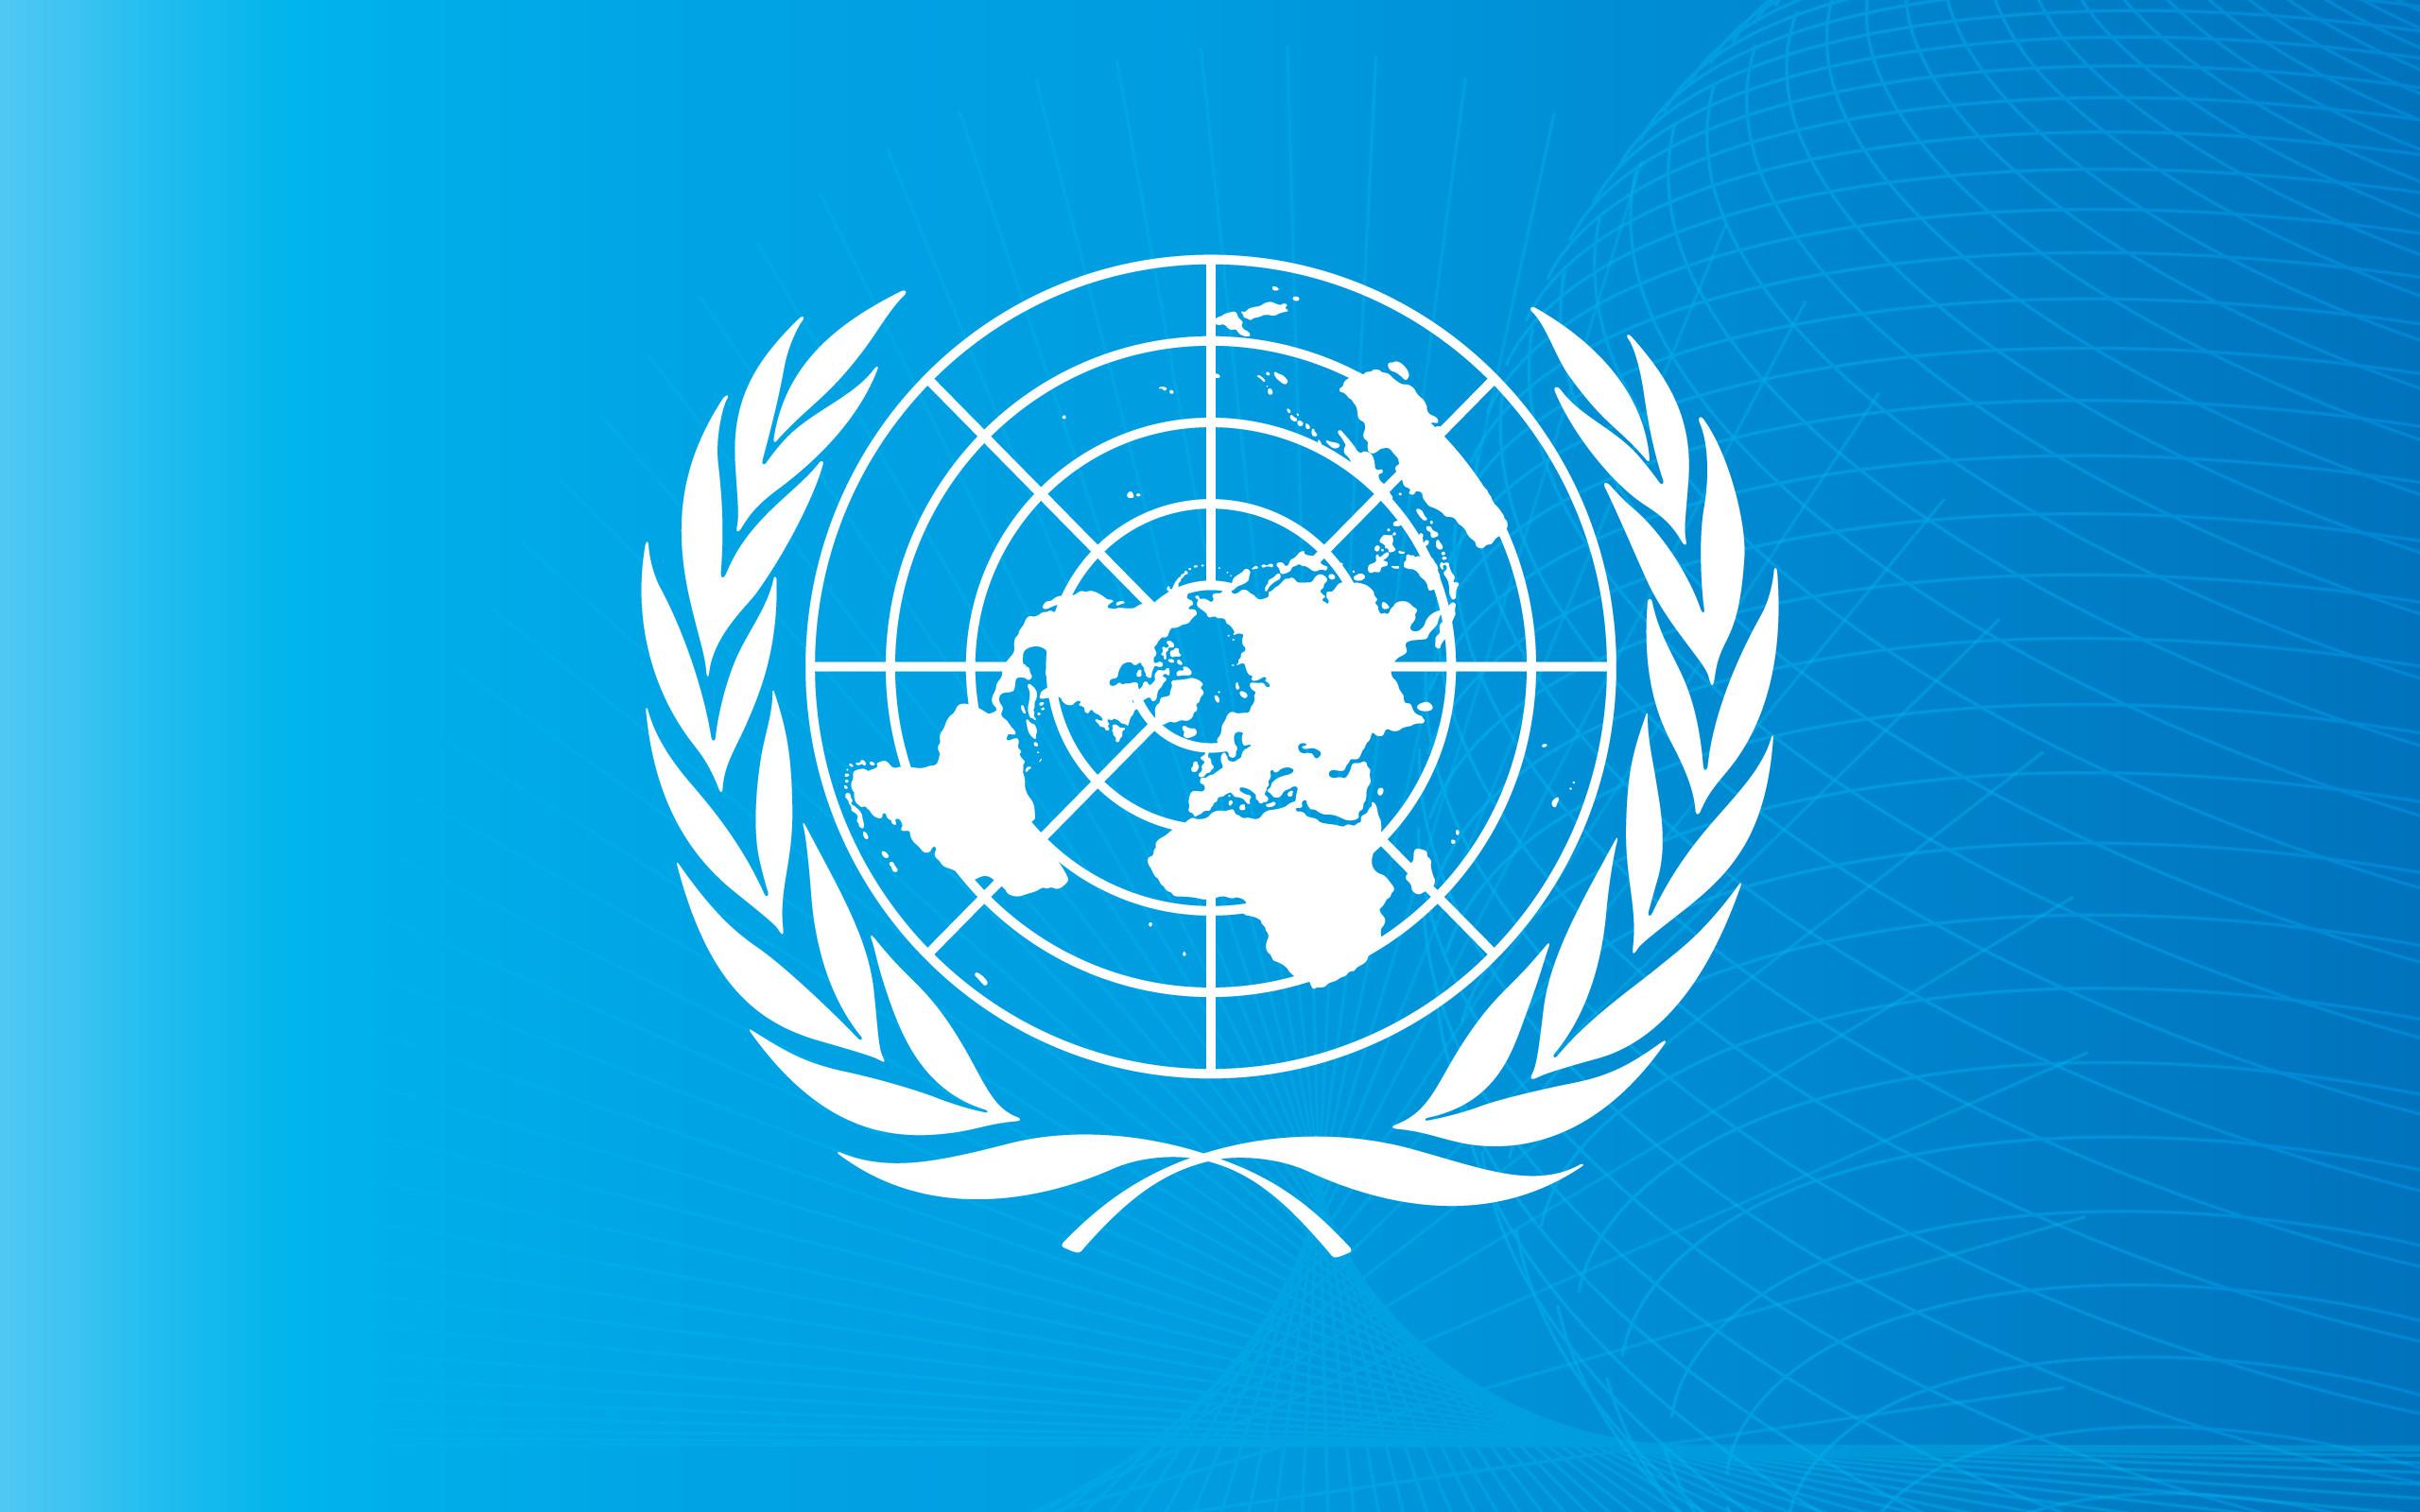 United Nations [2560x1600] wallpaper 2560x1600